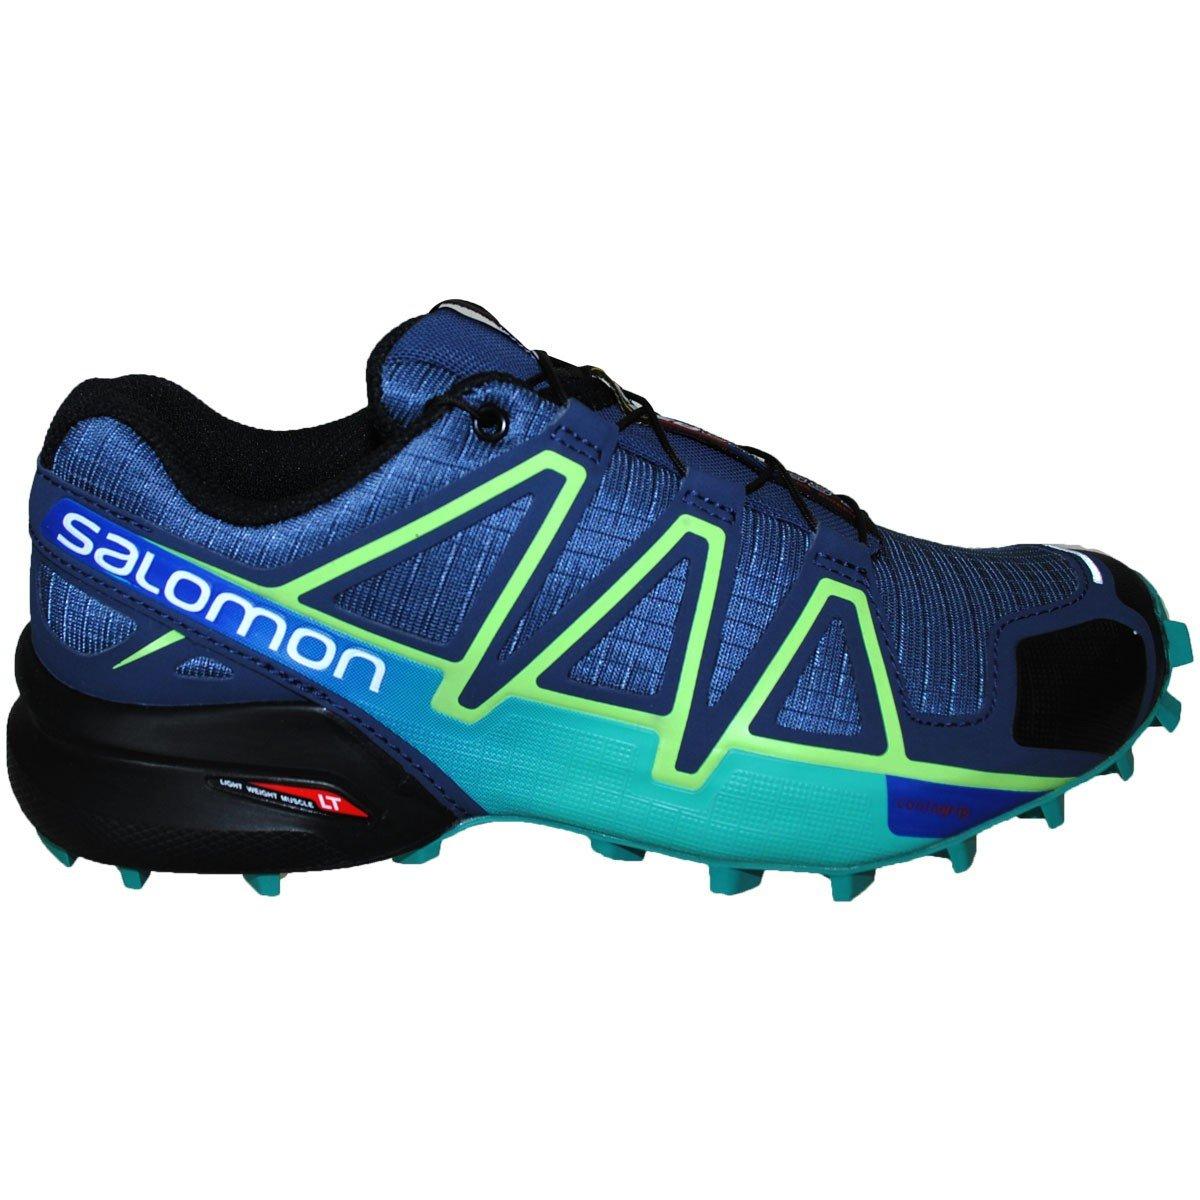 Ténis Salomon Speedcross 4 Agora F Compre Agora 4 Netsapatos cb152a